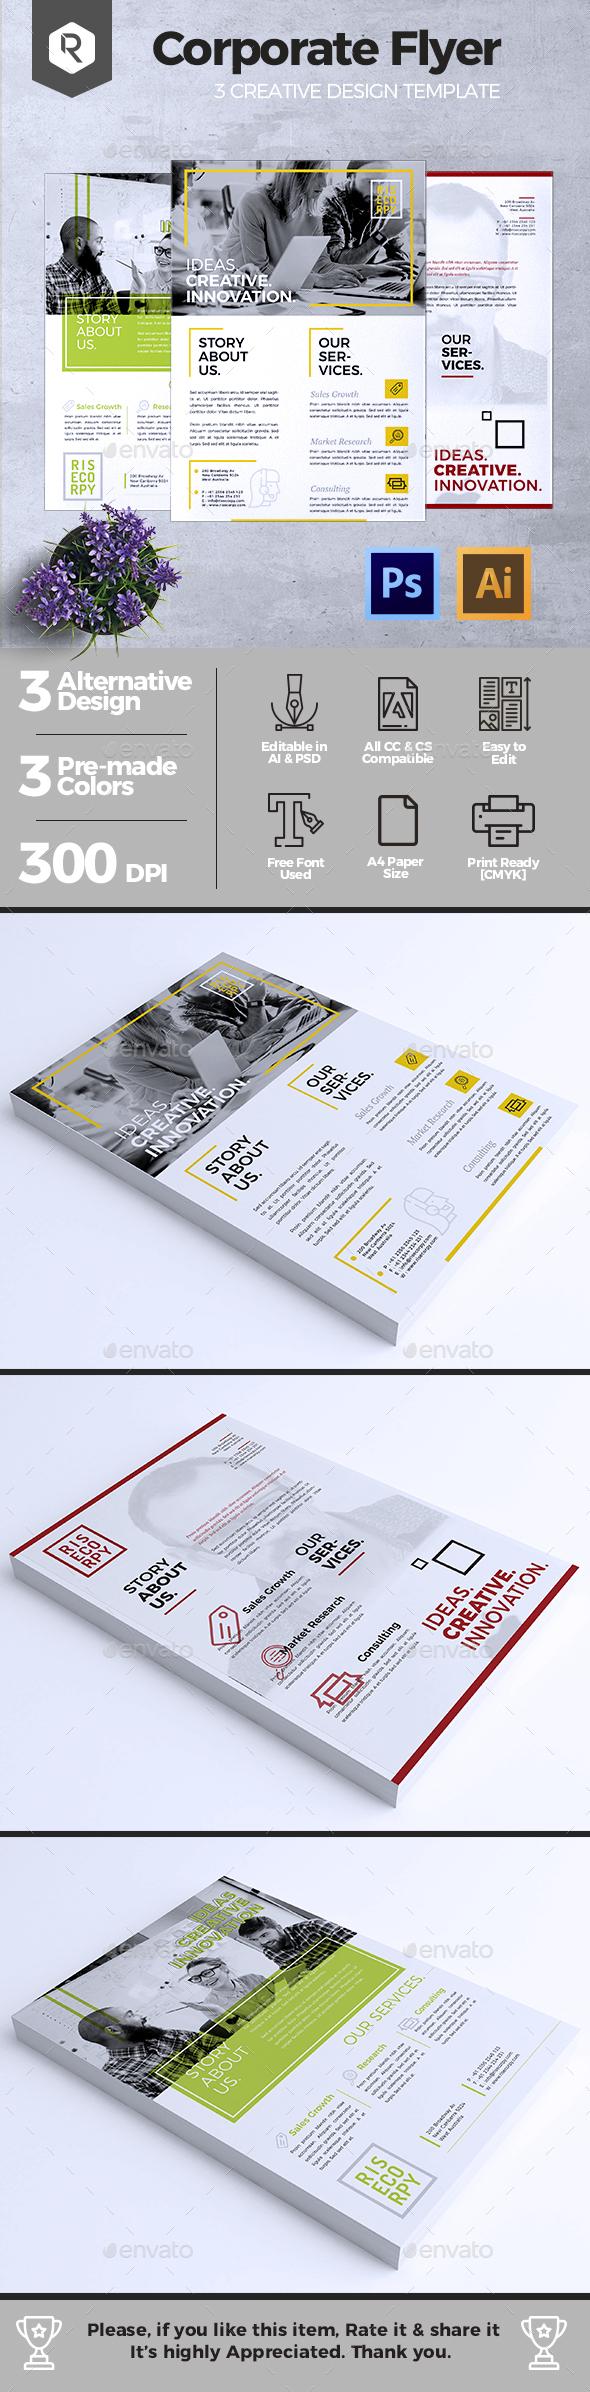 Creative Corporate Flyer Vol. 04 - Corporate Flyers